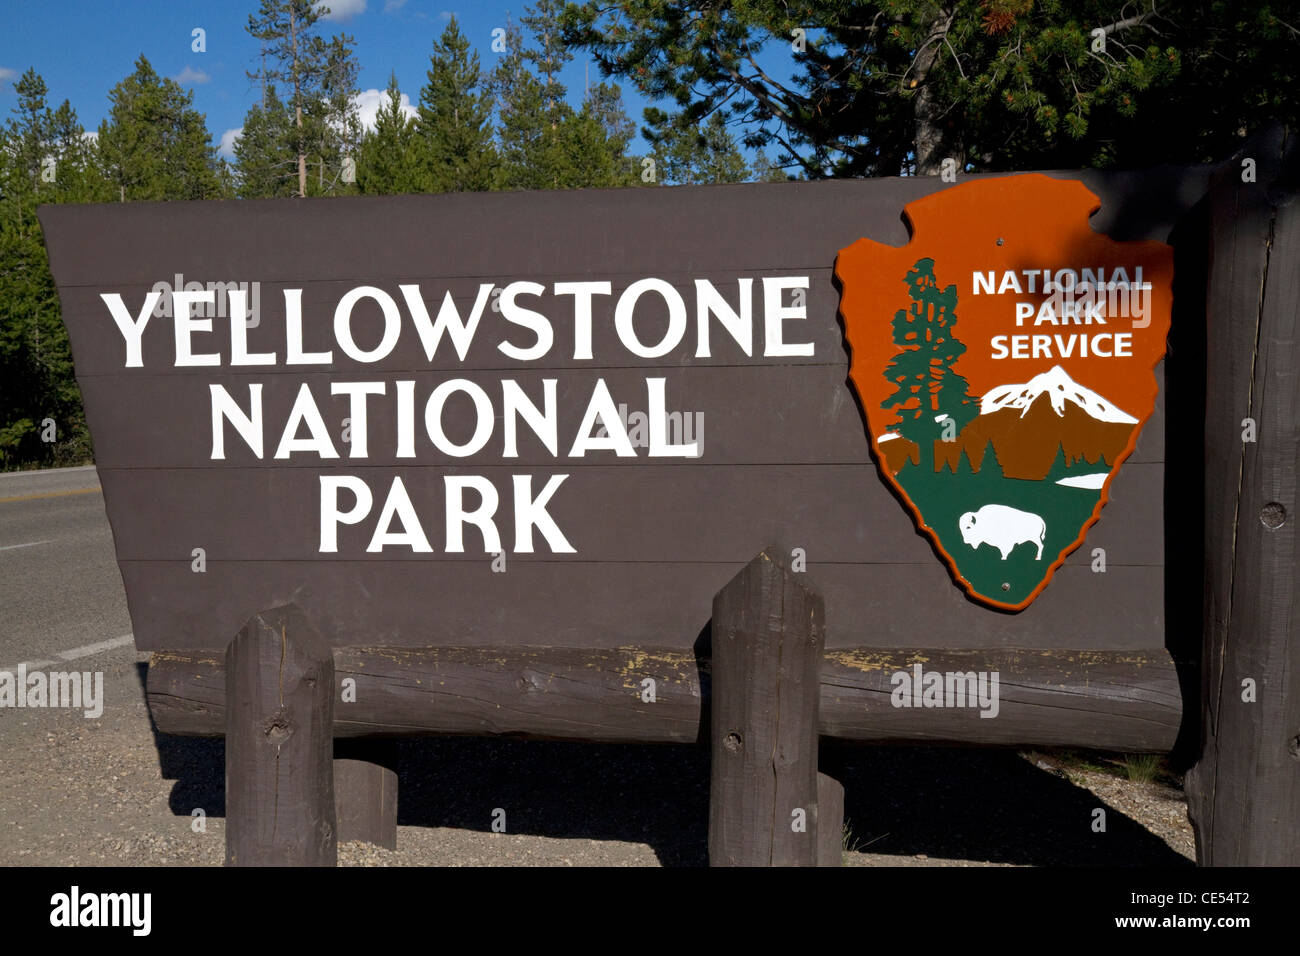 Yellowstone National Park entrance sign, West Yellowstone, Montana, USA. - Stock Image